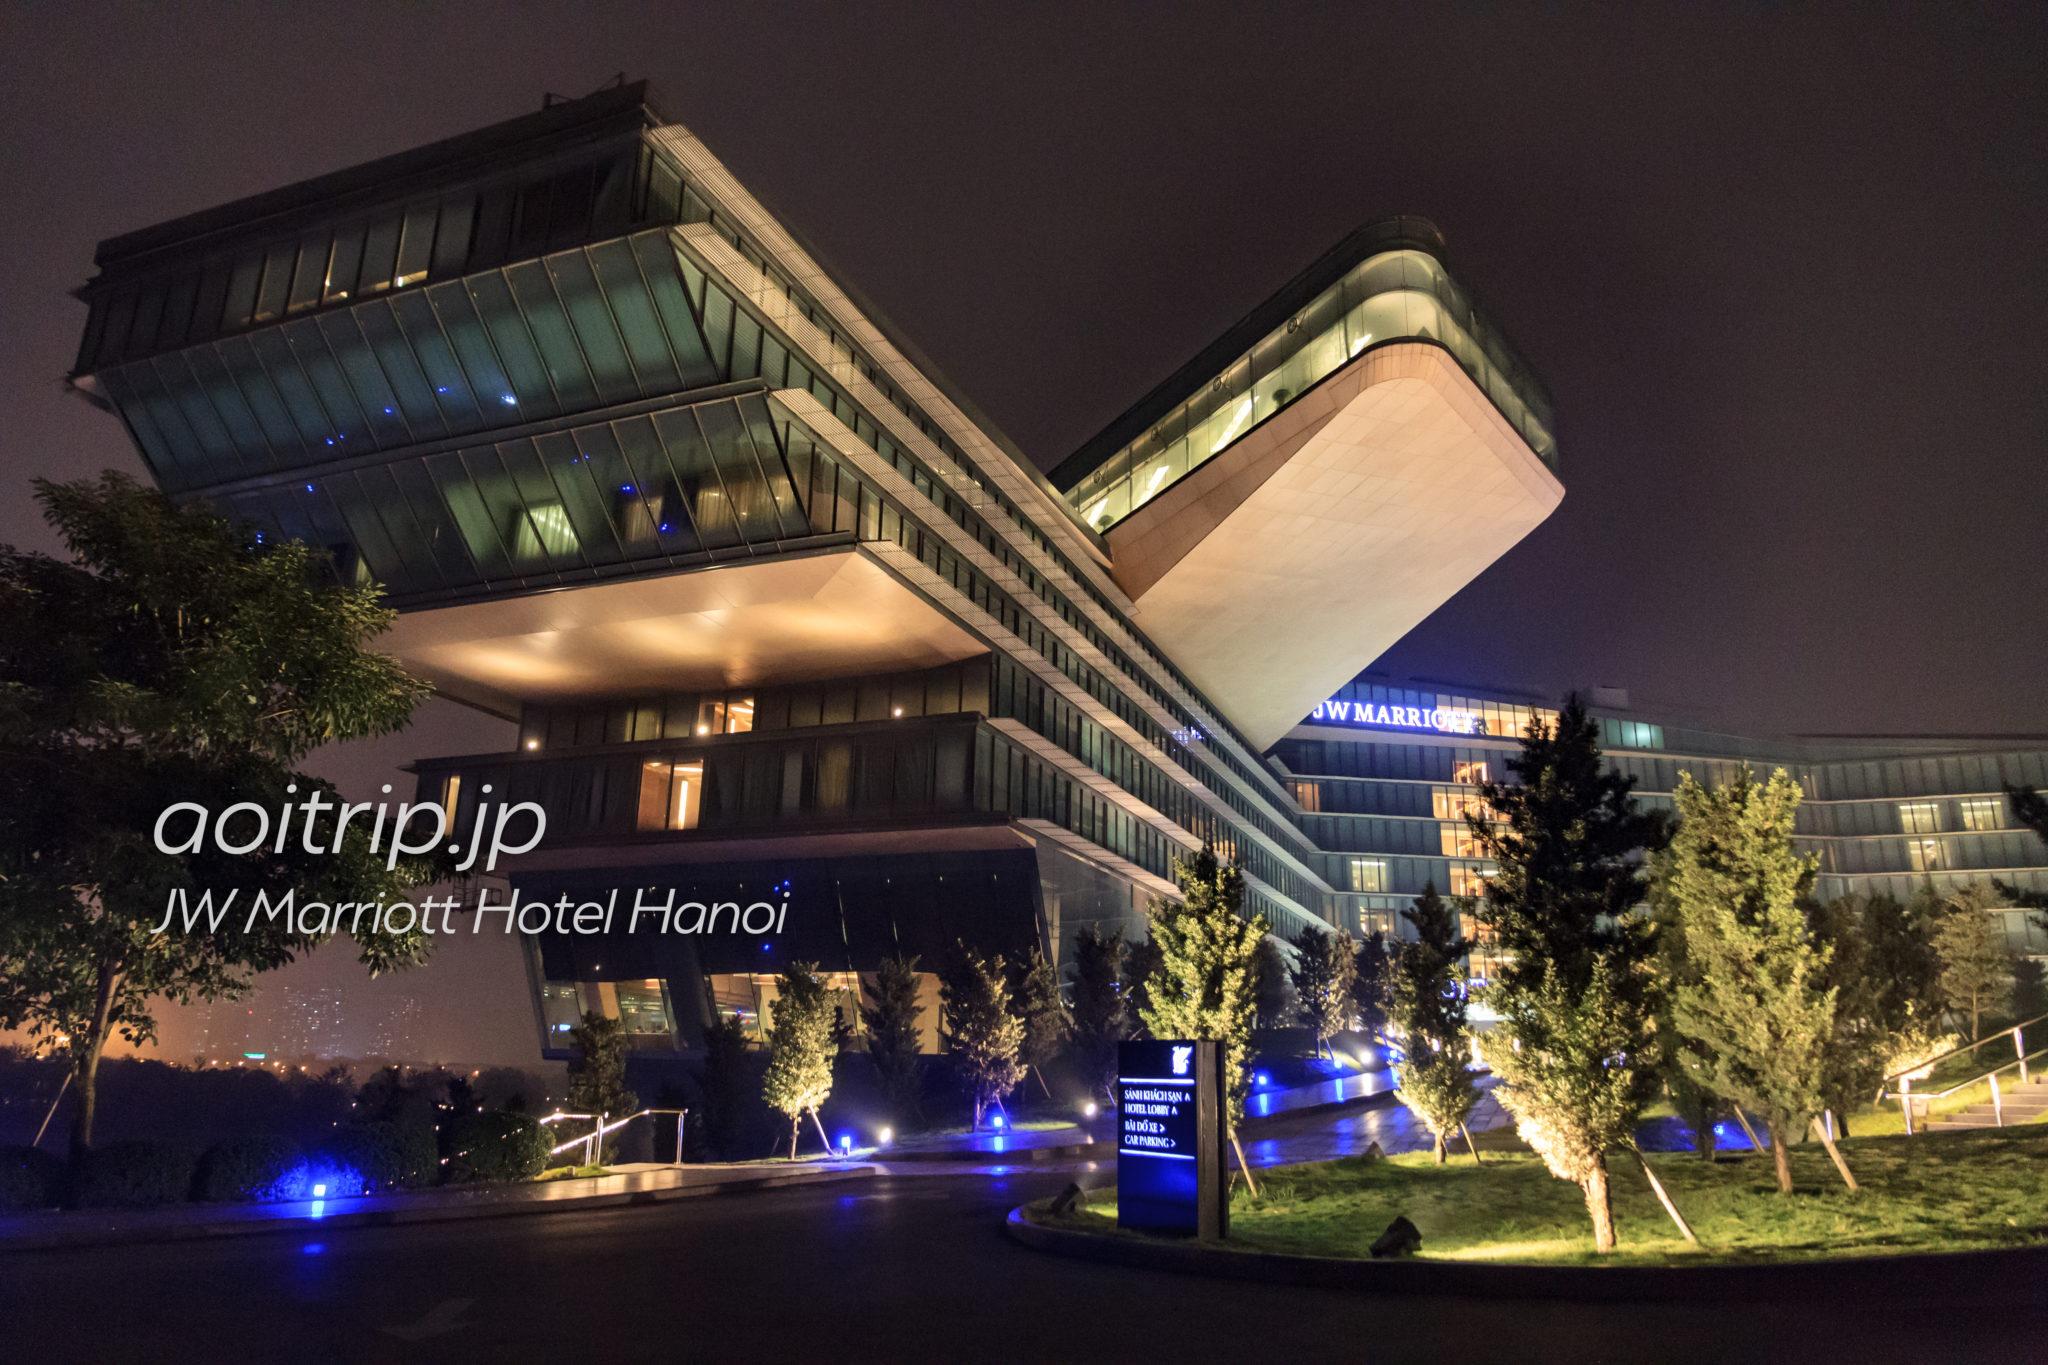 JWマリオット ホテル ハノイ宿泊記|JW Marriott Hotel Hanoi